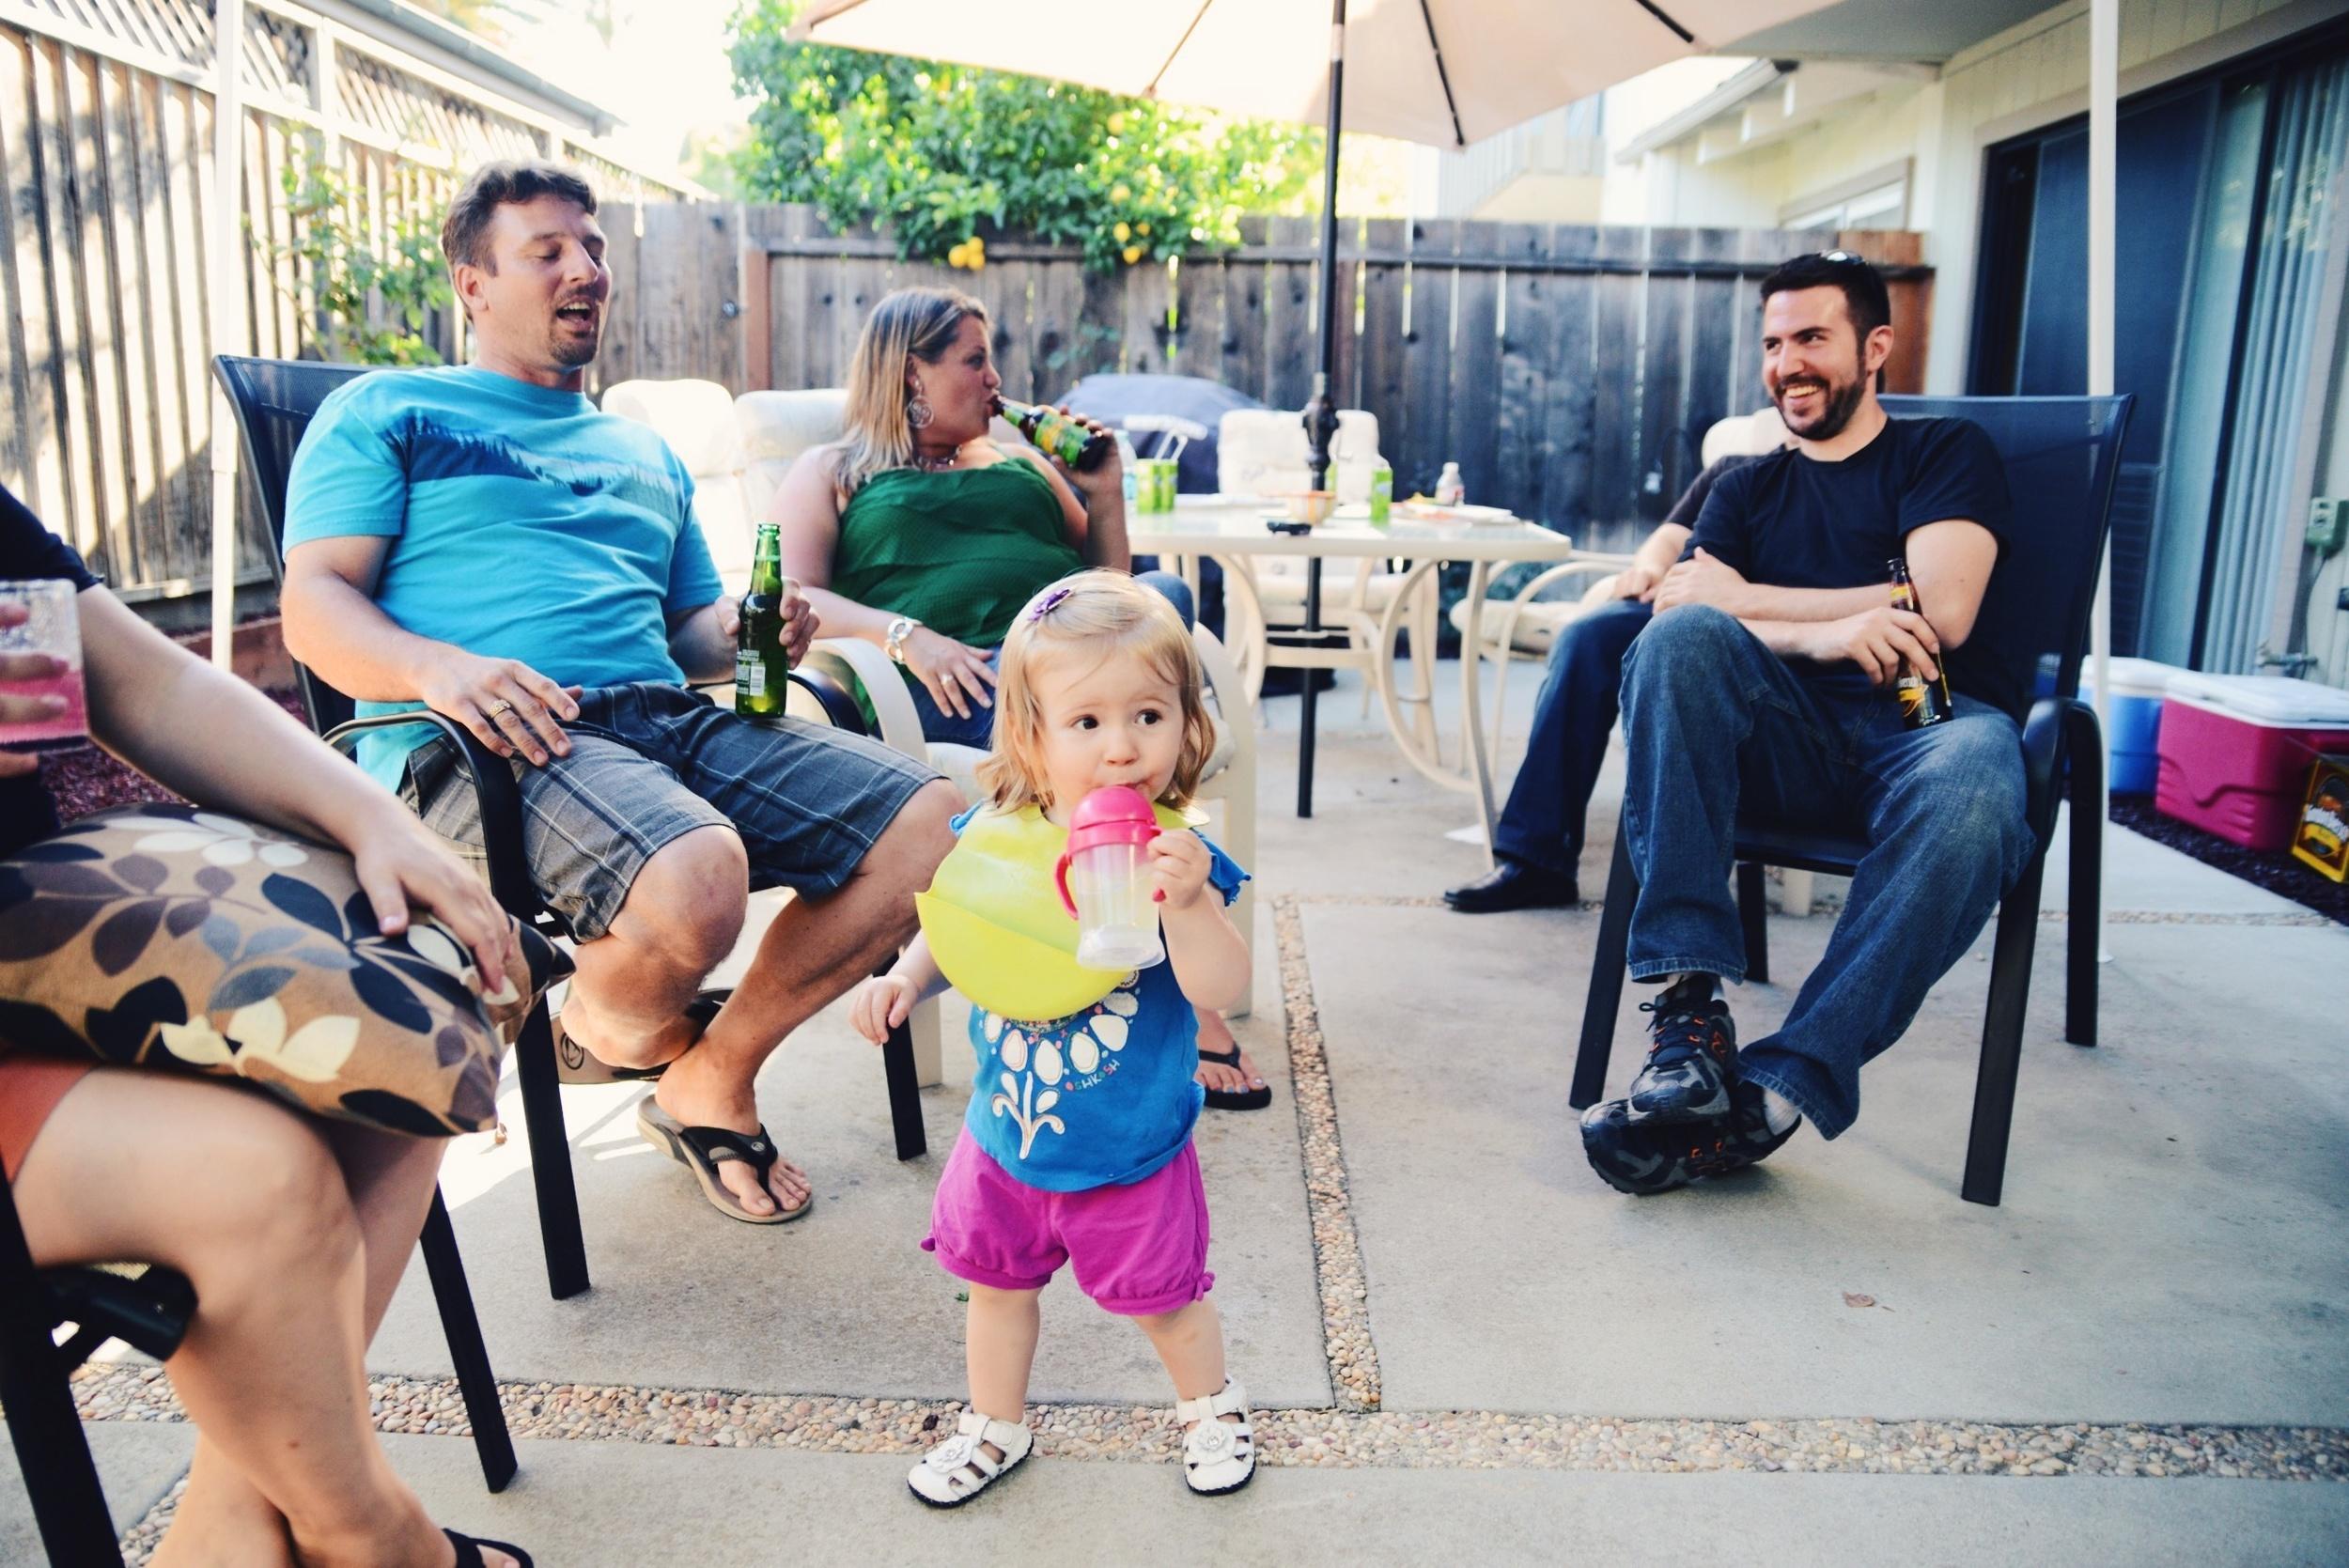 Everyone hanging out in Erika's backyard.